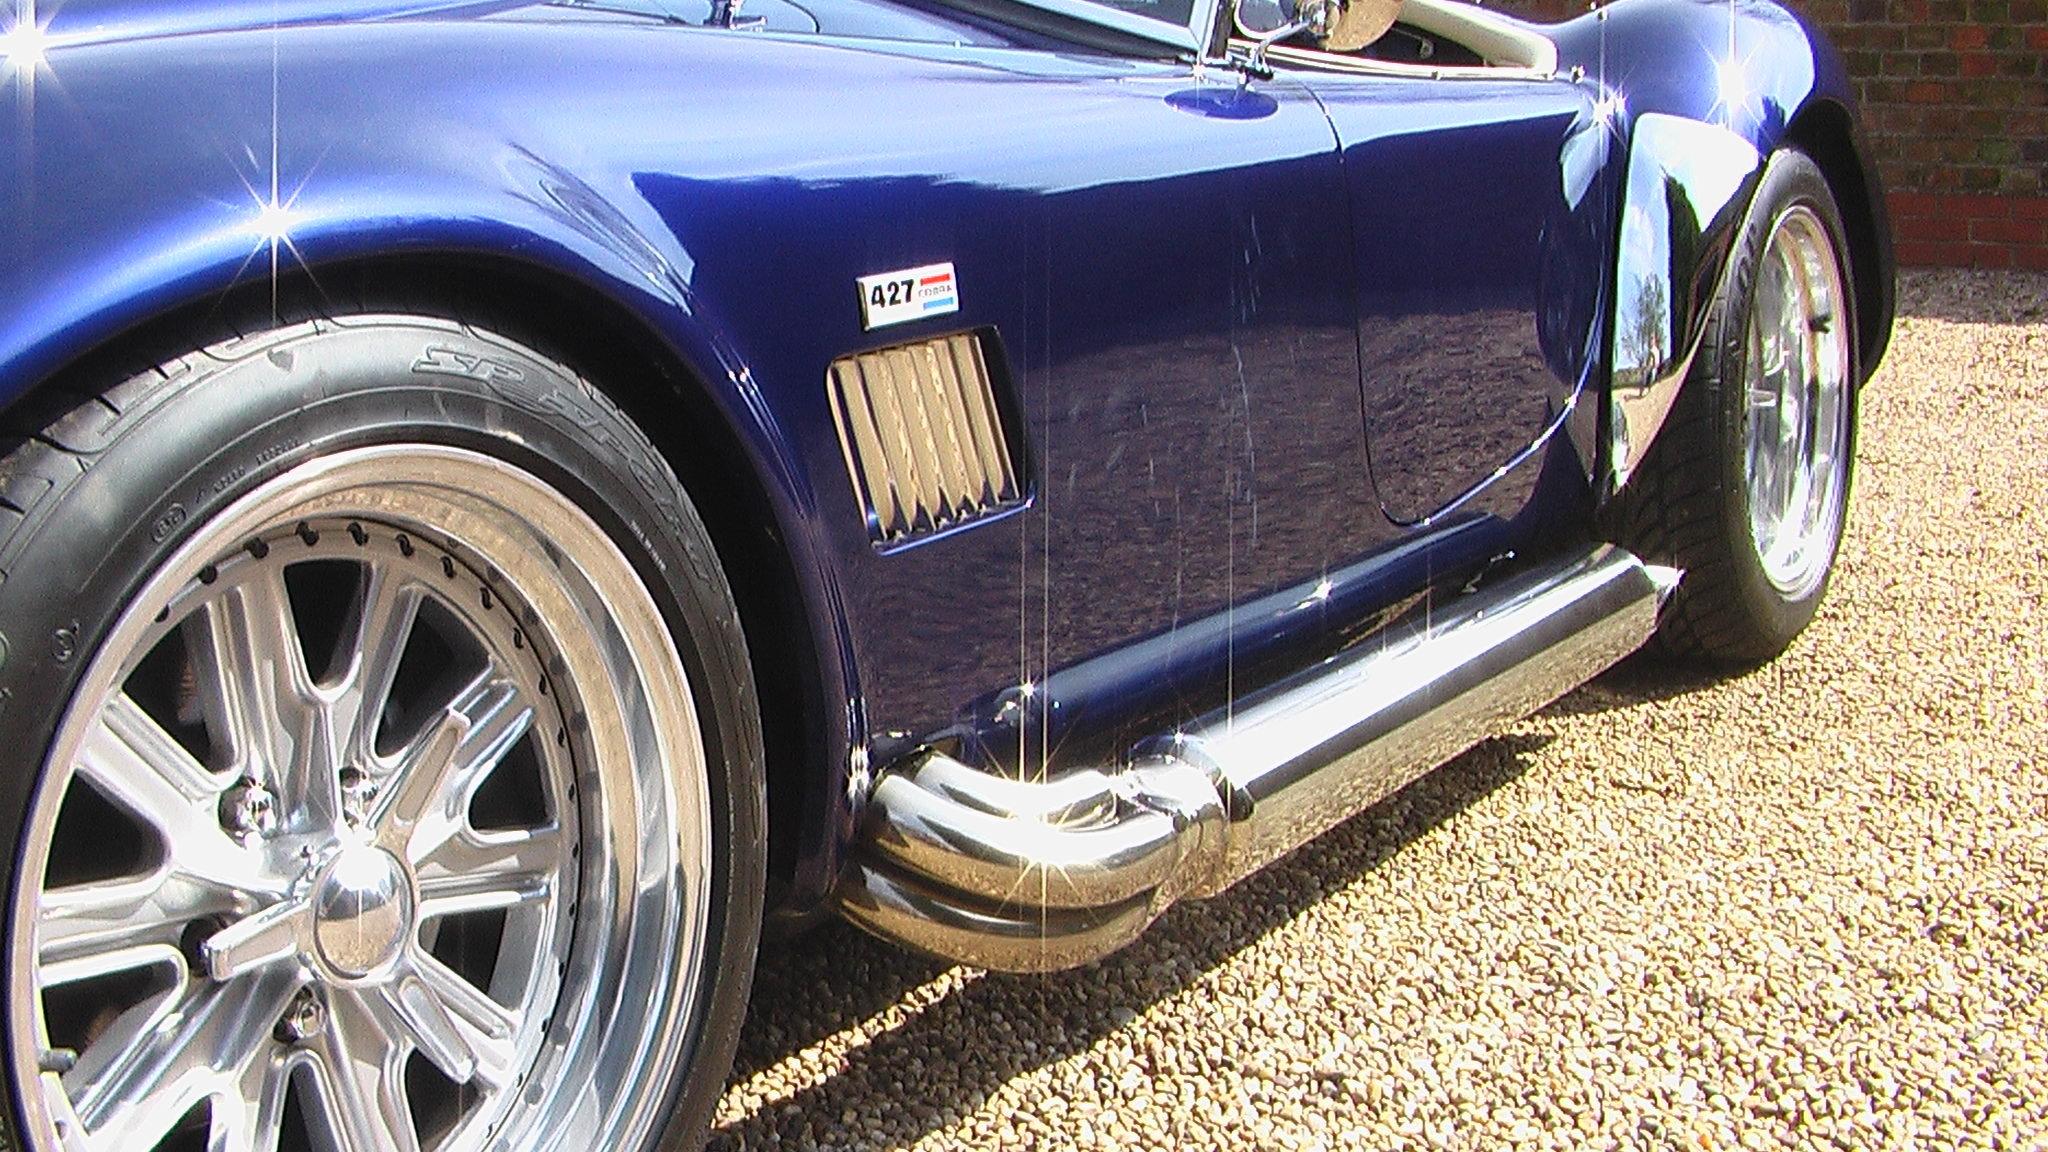 1998 6.5L CHEVY V8, DAX TOJEIRO COBRA For Sale (picture 3 of 6)